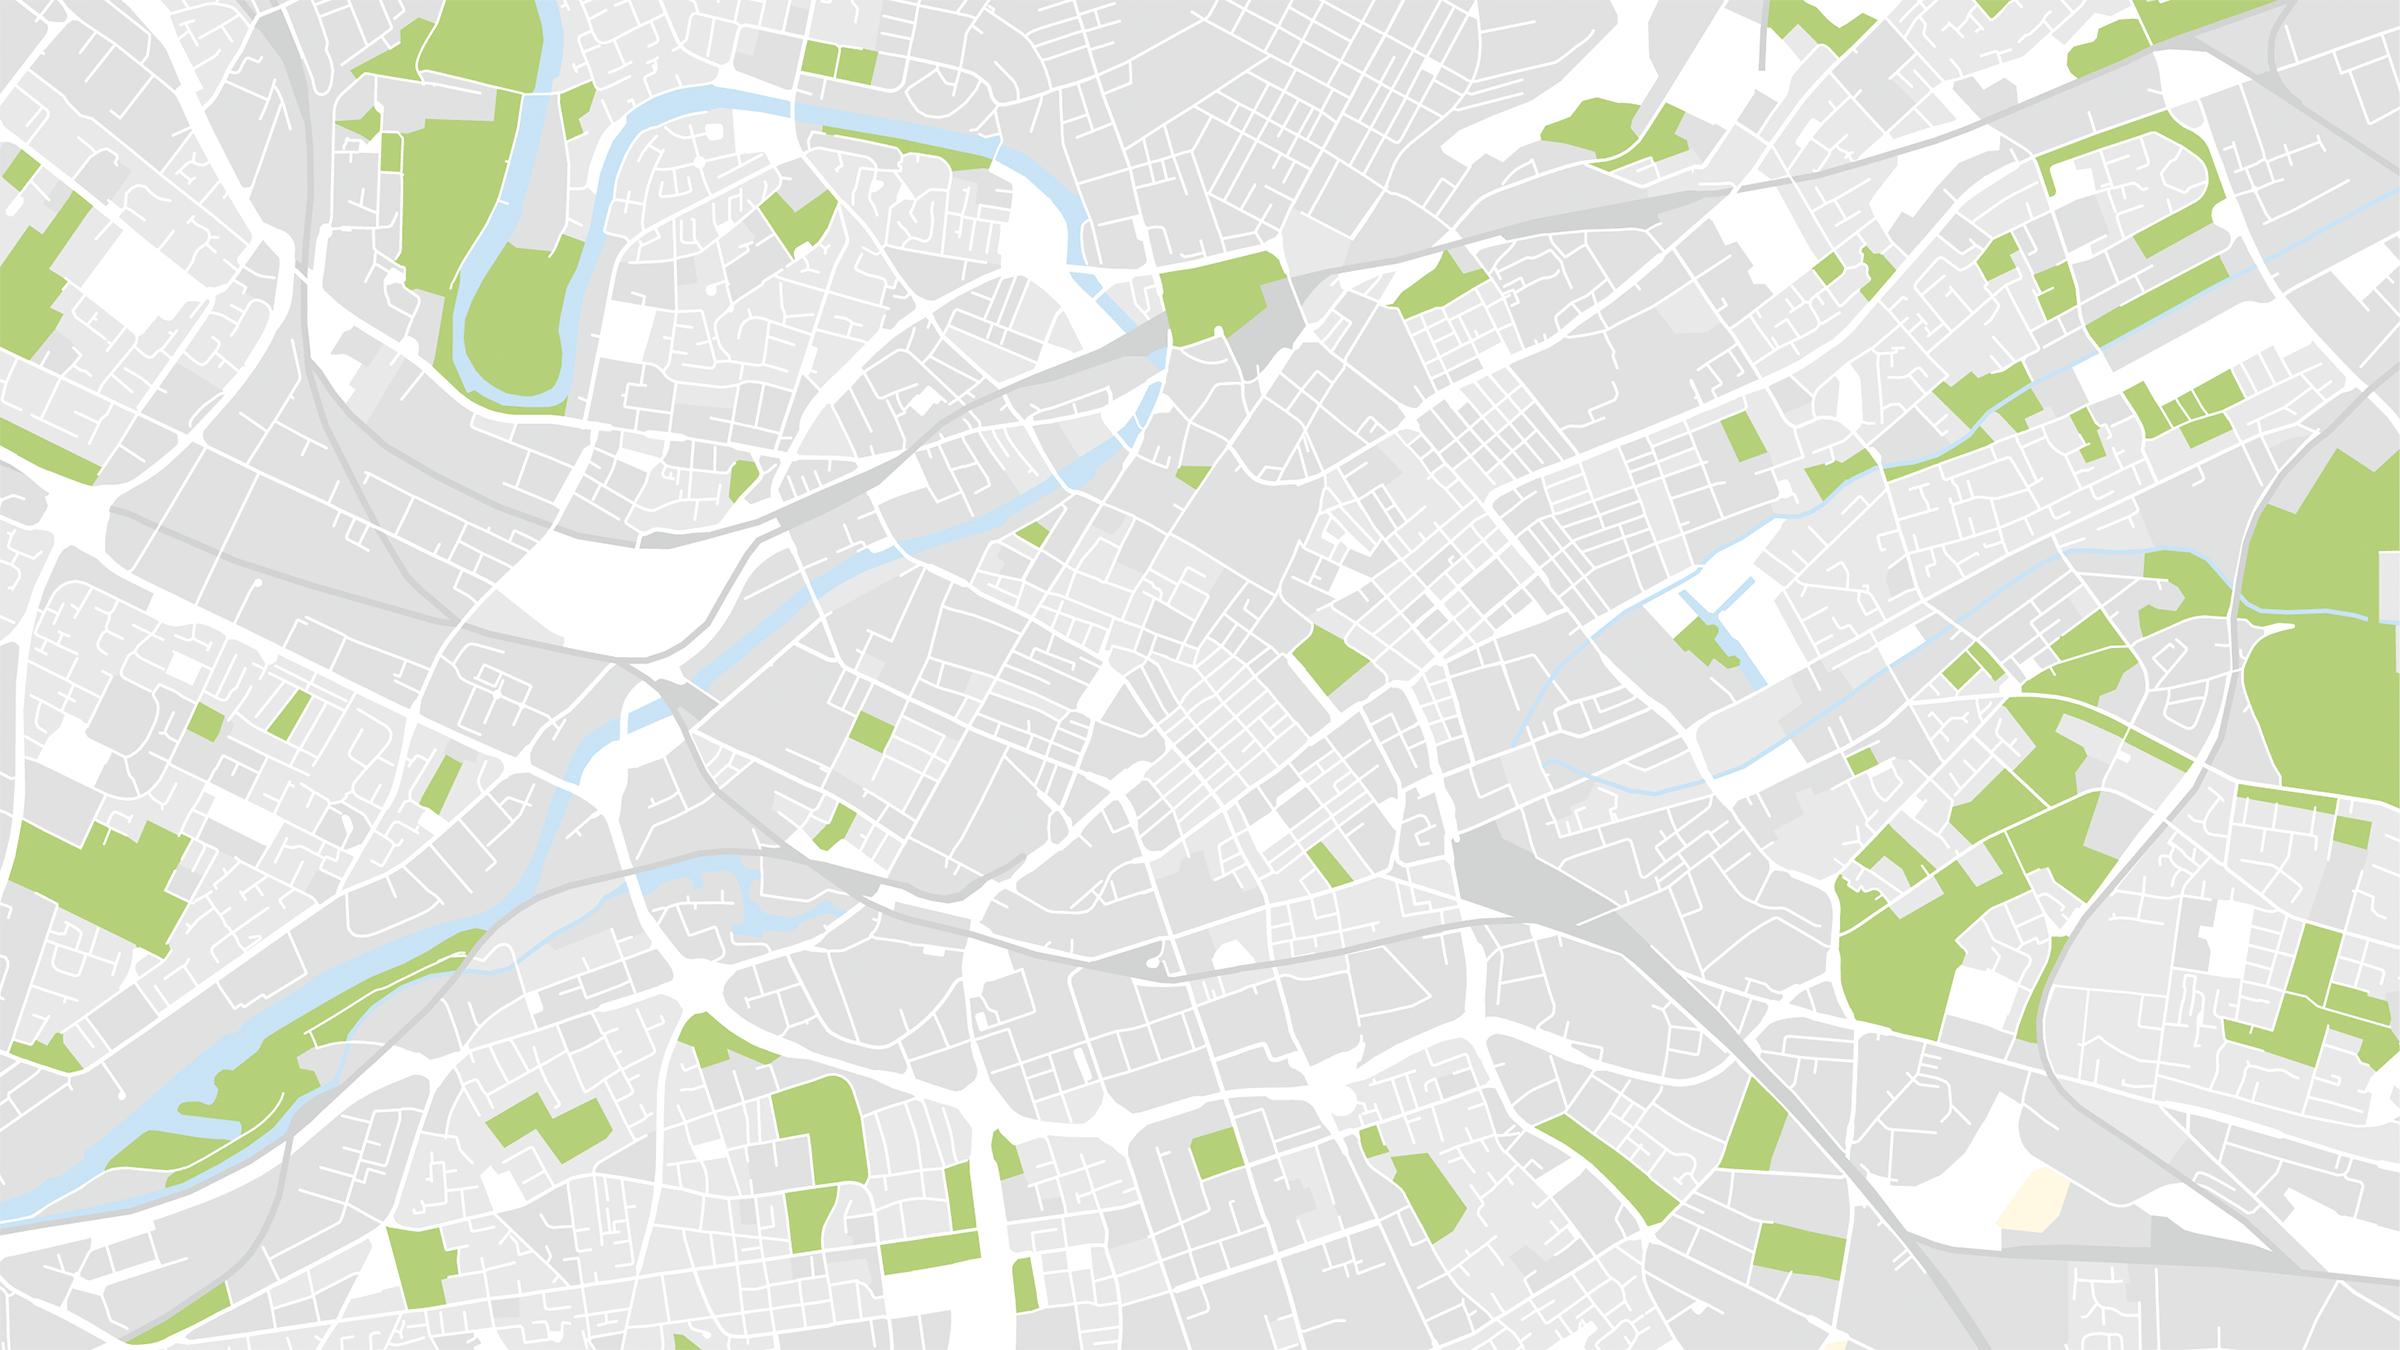 Mapa de Manchester